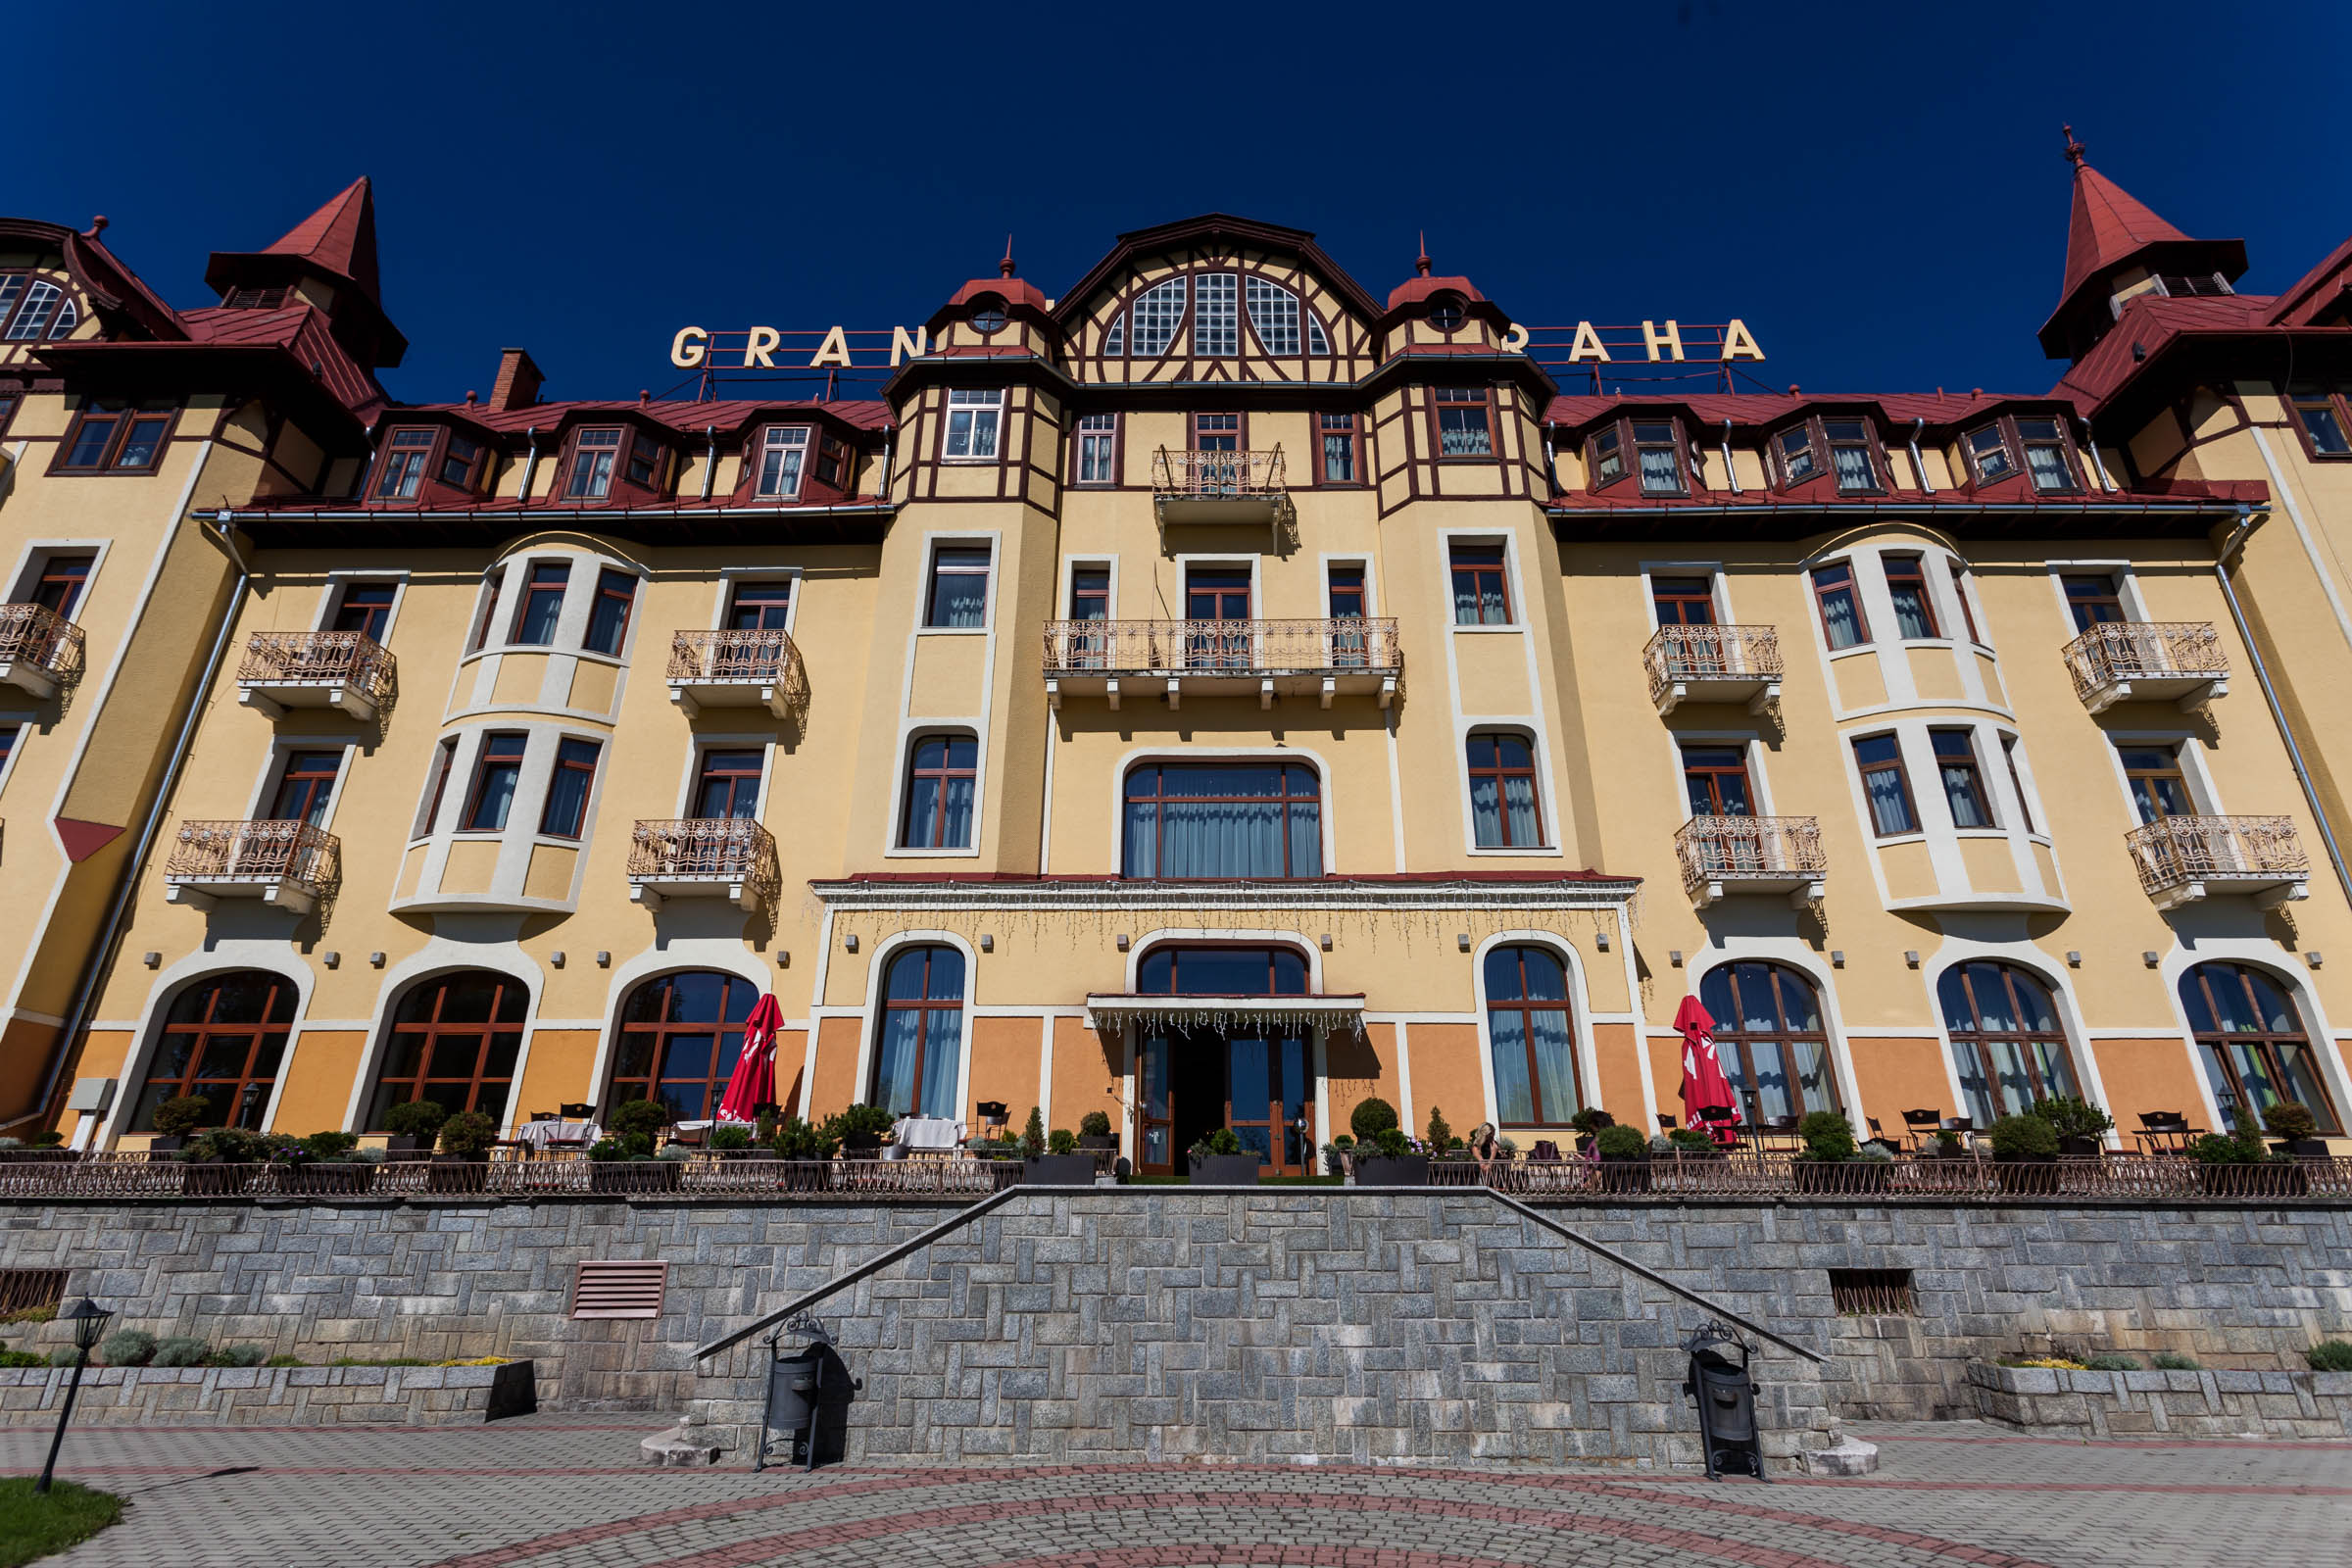 IRCG 2017 Tatranská Lomnica, Grandhotel Praha - exteriér hotela